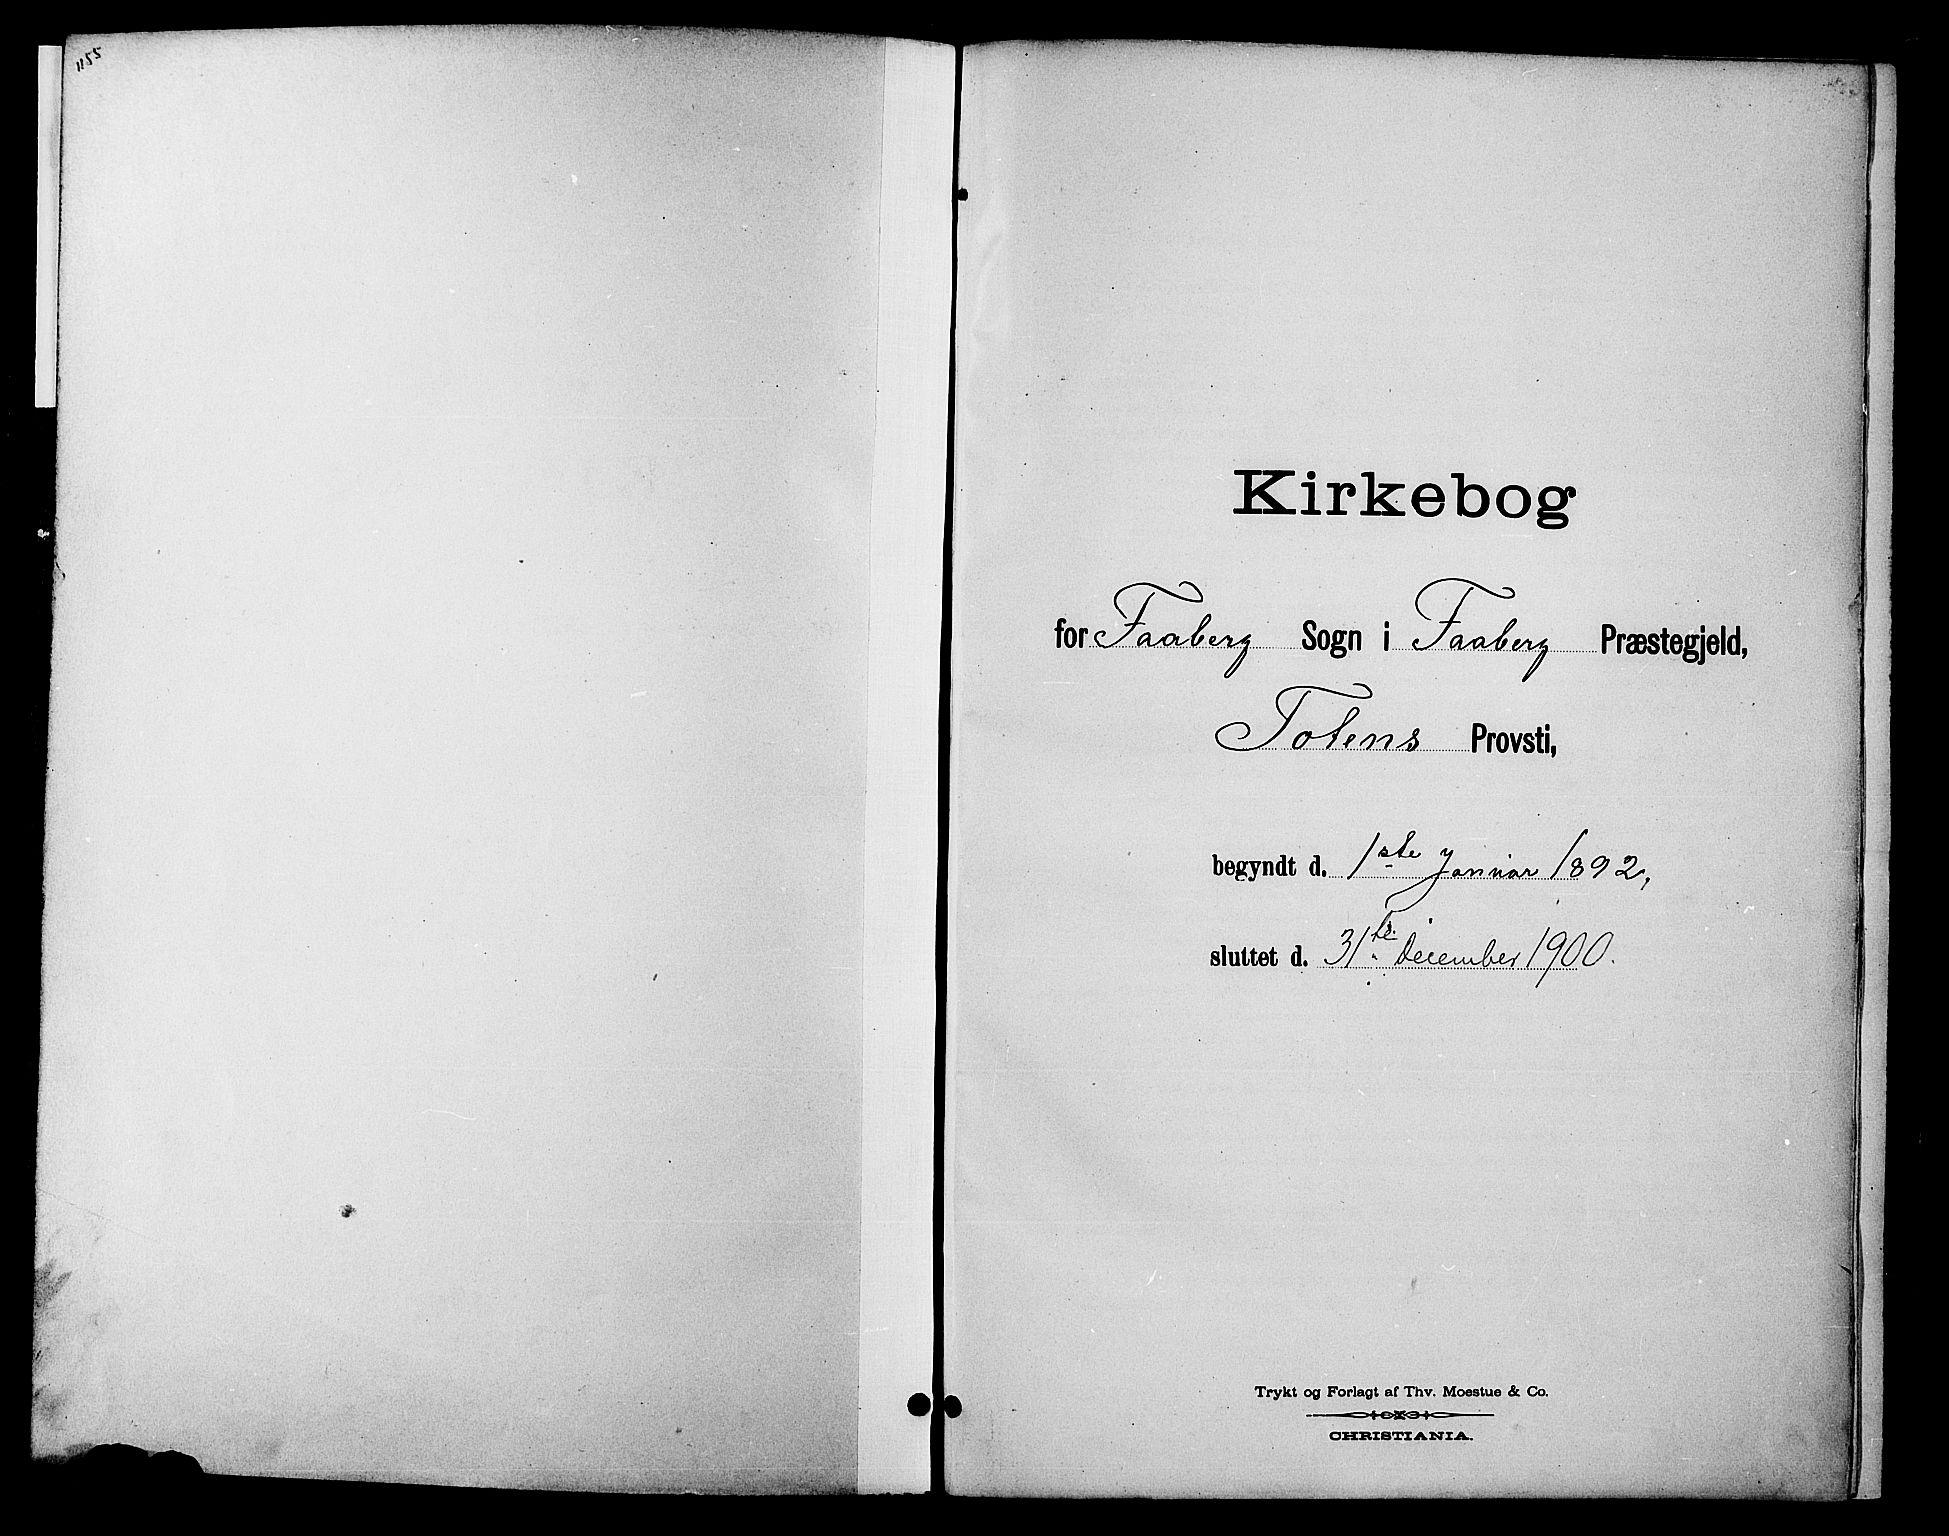 SAH, Fåberg prestekontor, Klokkerbok nr. 10, 1892-1900